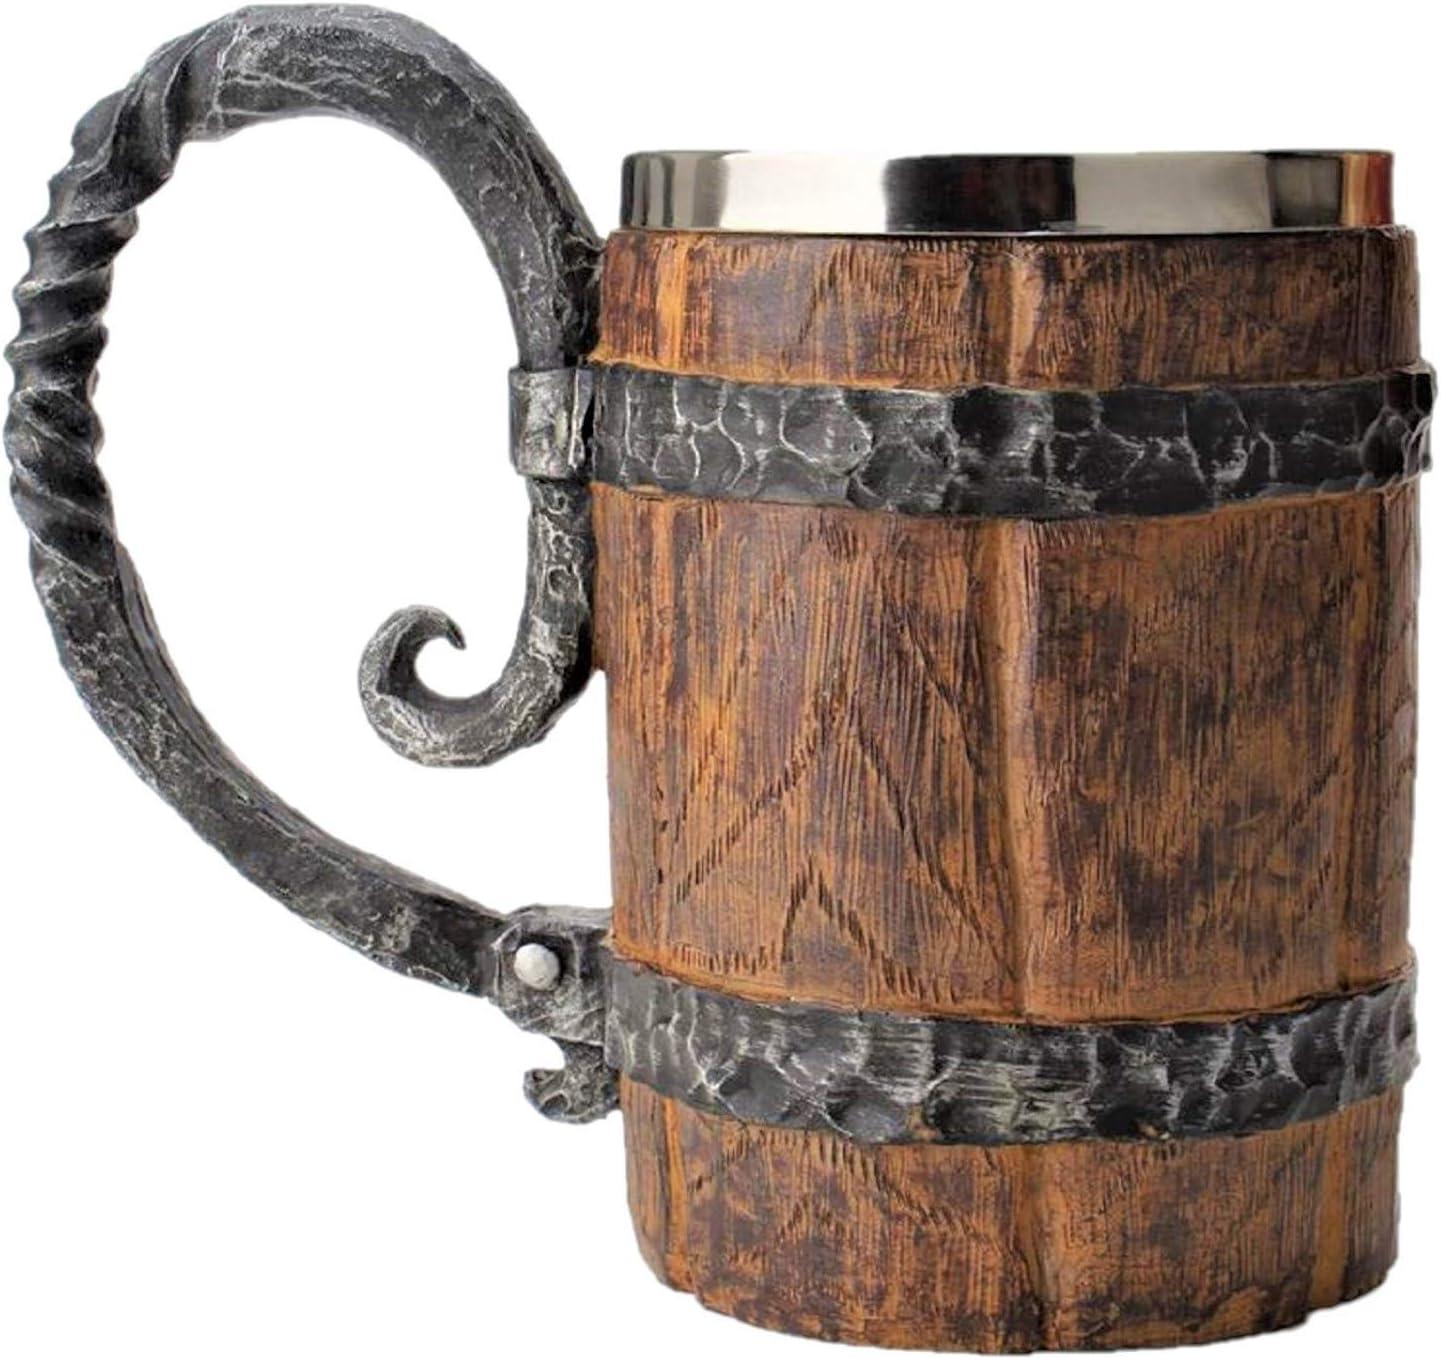 Handmade Stainless Steel Beer Wine Barrel Cup Vi sold out Wooden Mug Wood Manufacturer direct delivery